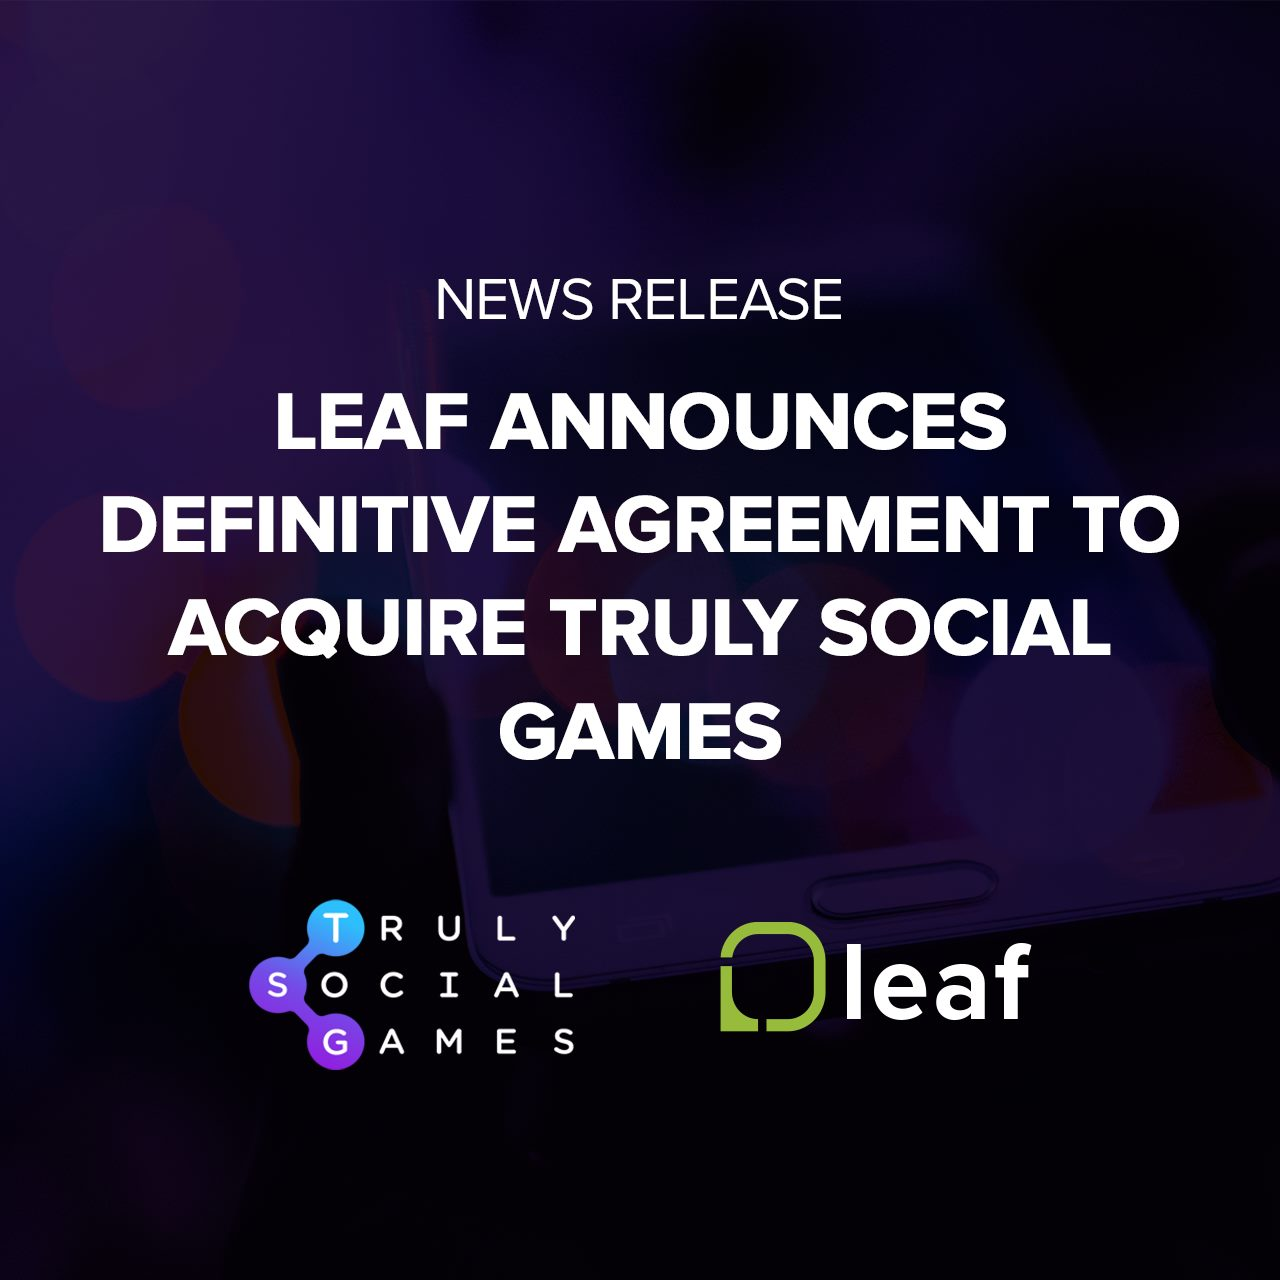 Cooper DuBois Portland CEO Announces Leaf Mobile Acquiring TSG (1)